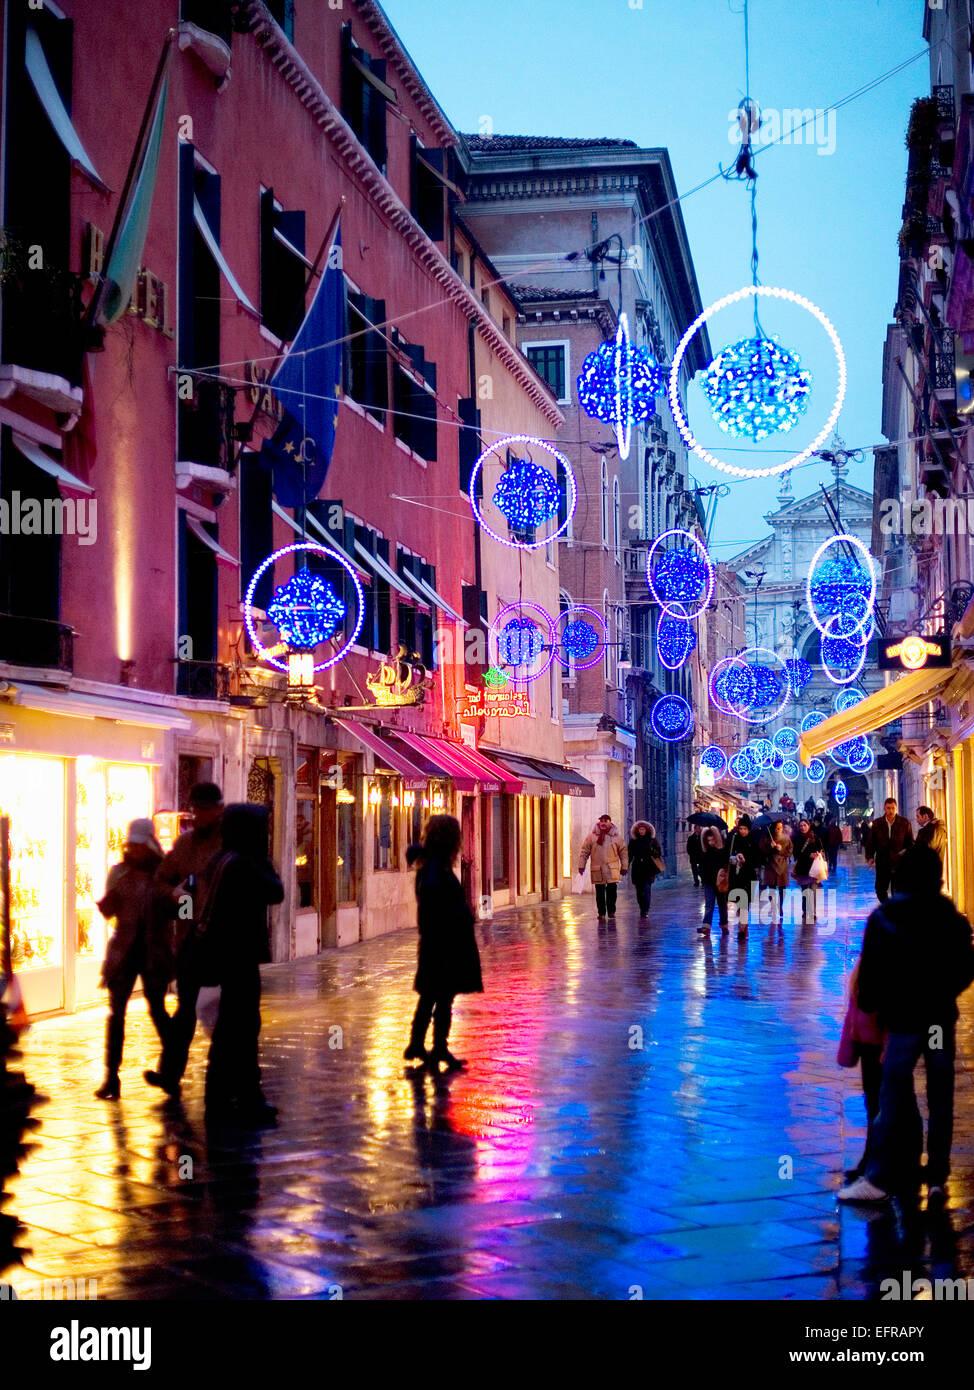 People walking in a narrow street at night. Street lights ...